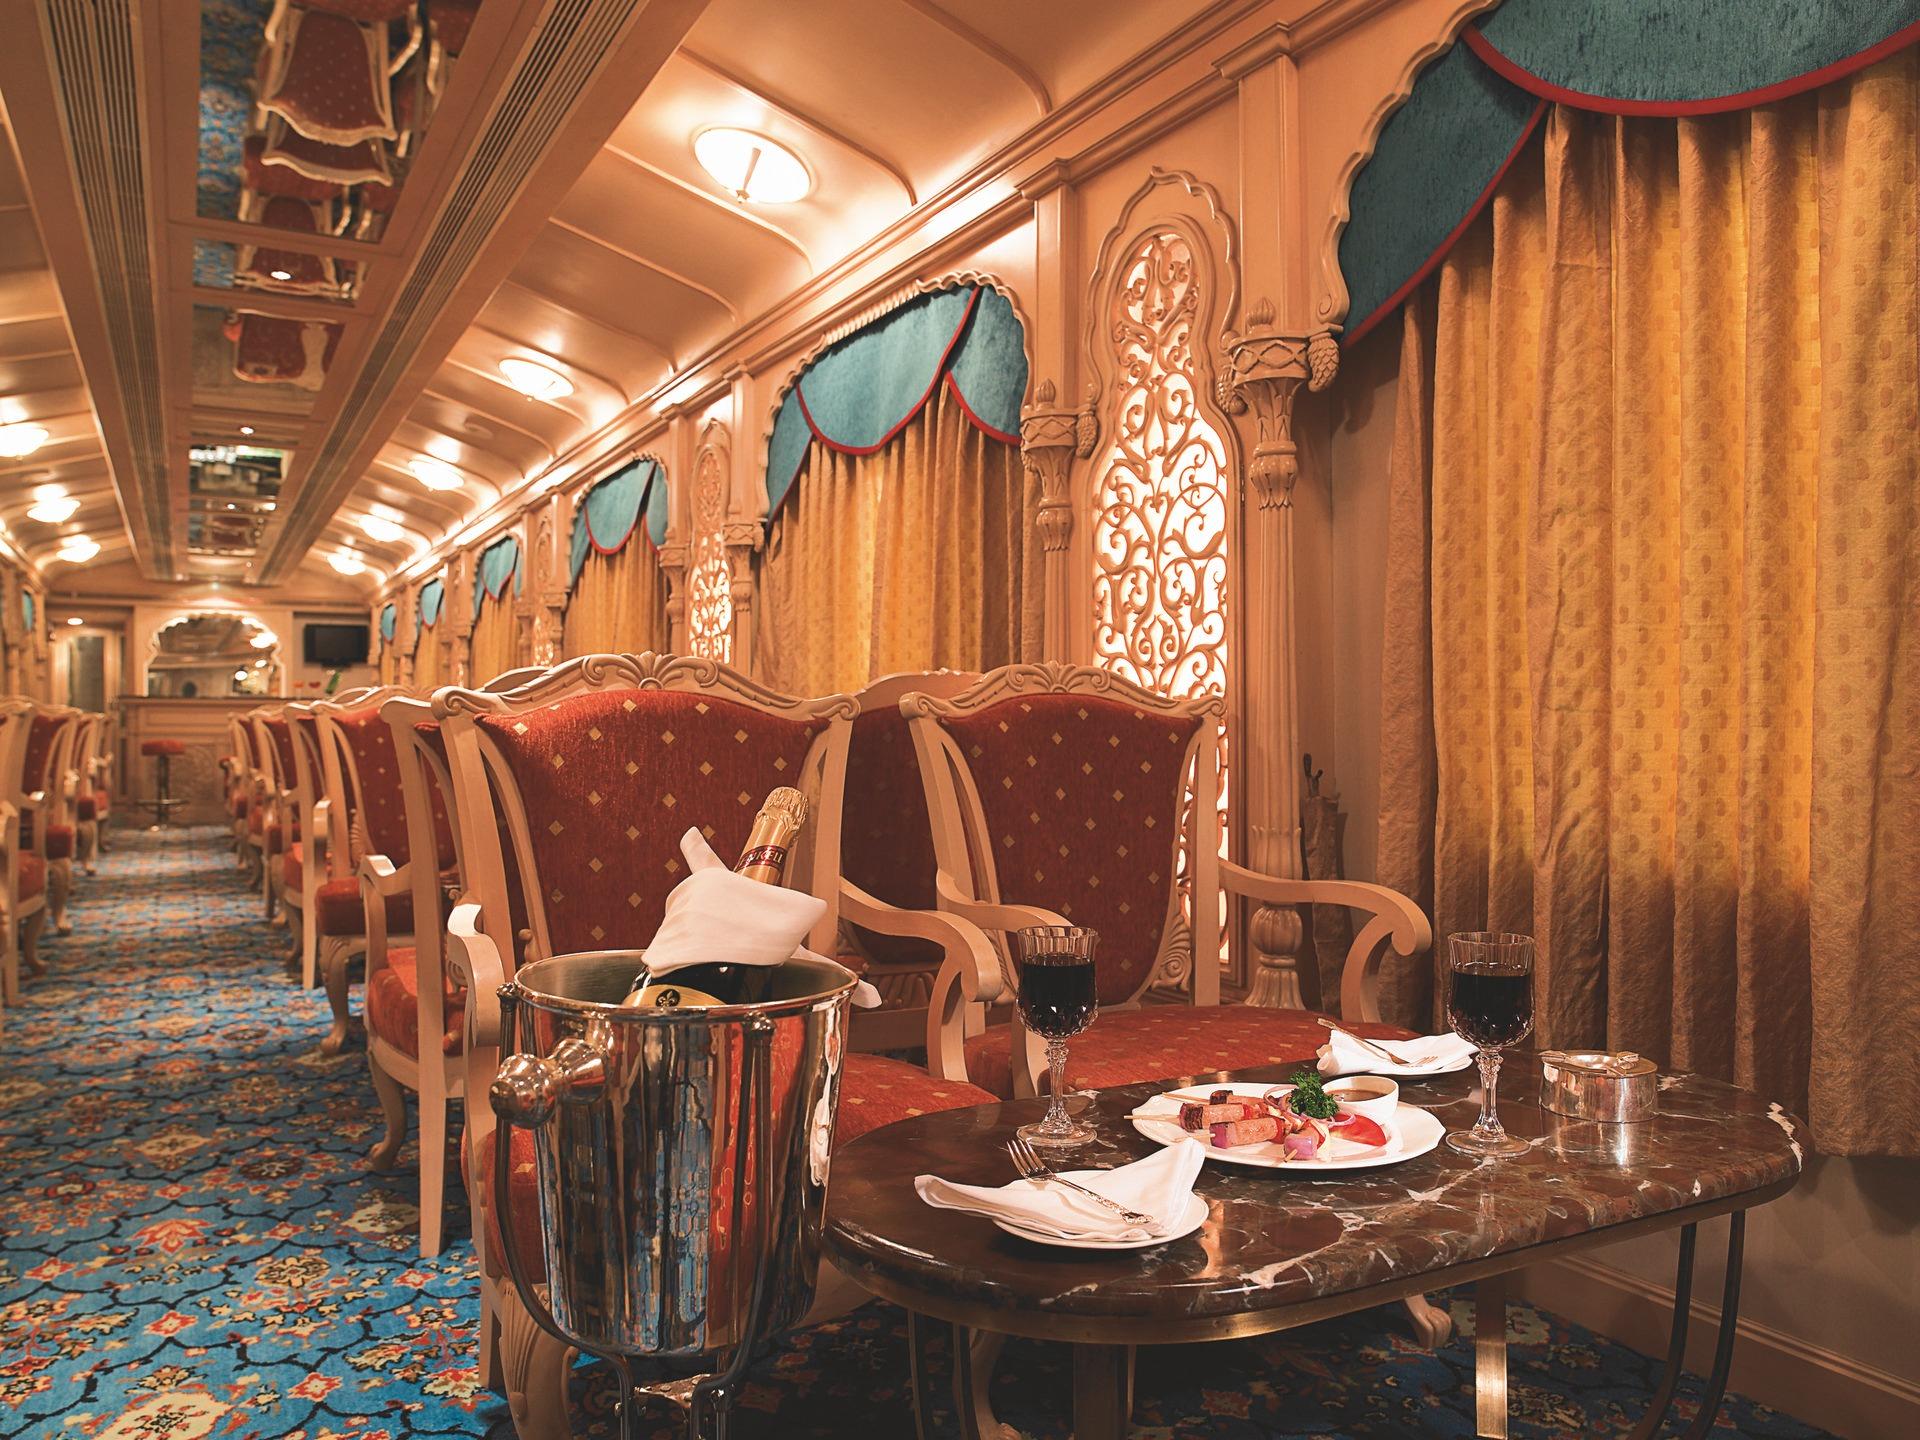 NOMAD-luksusowe-pociągi-Golden-Chariot-Indie-05-1